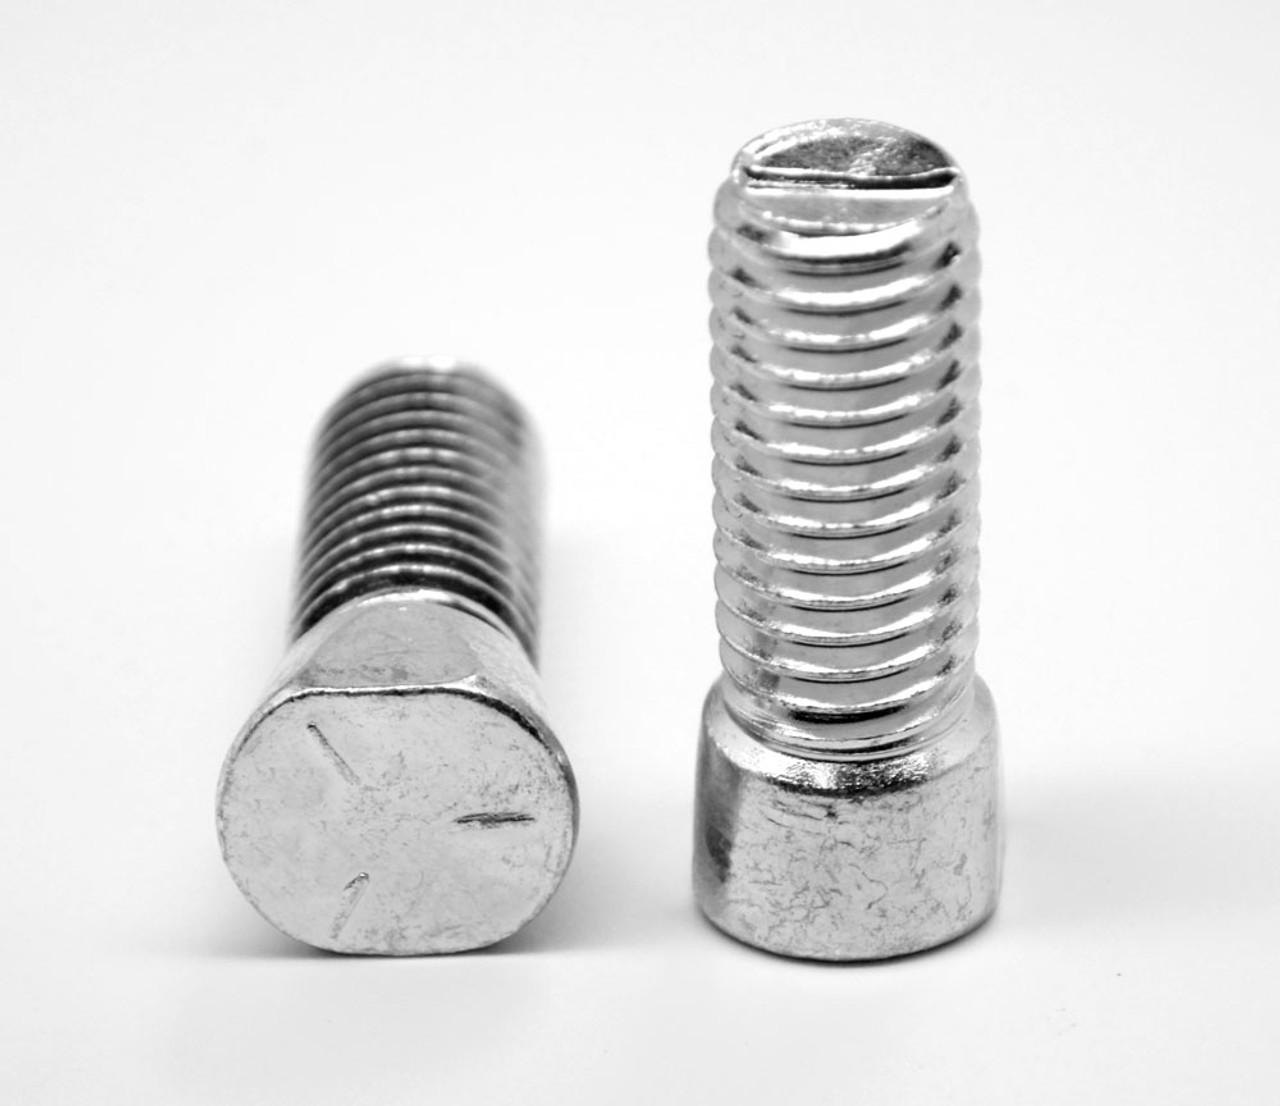 1//2-13X2 Grade 5 Plow Bolt with Number 3 Head Zinc